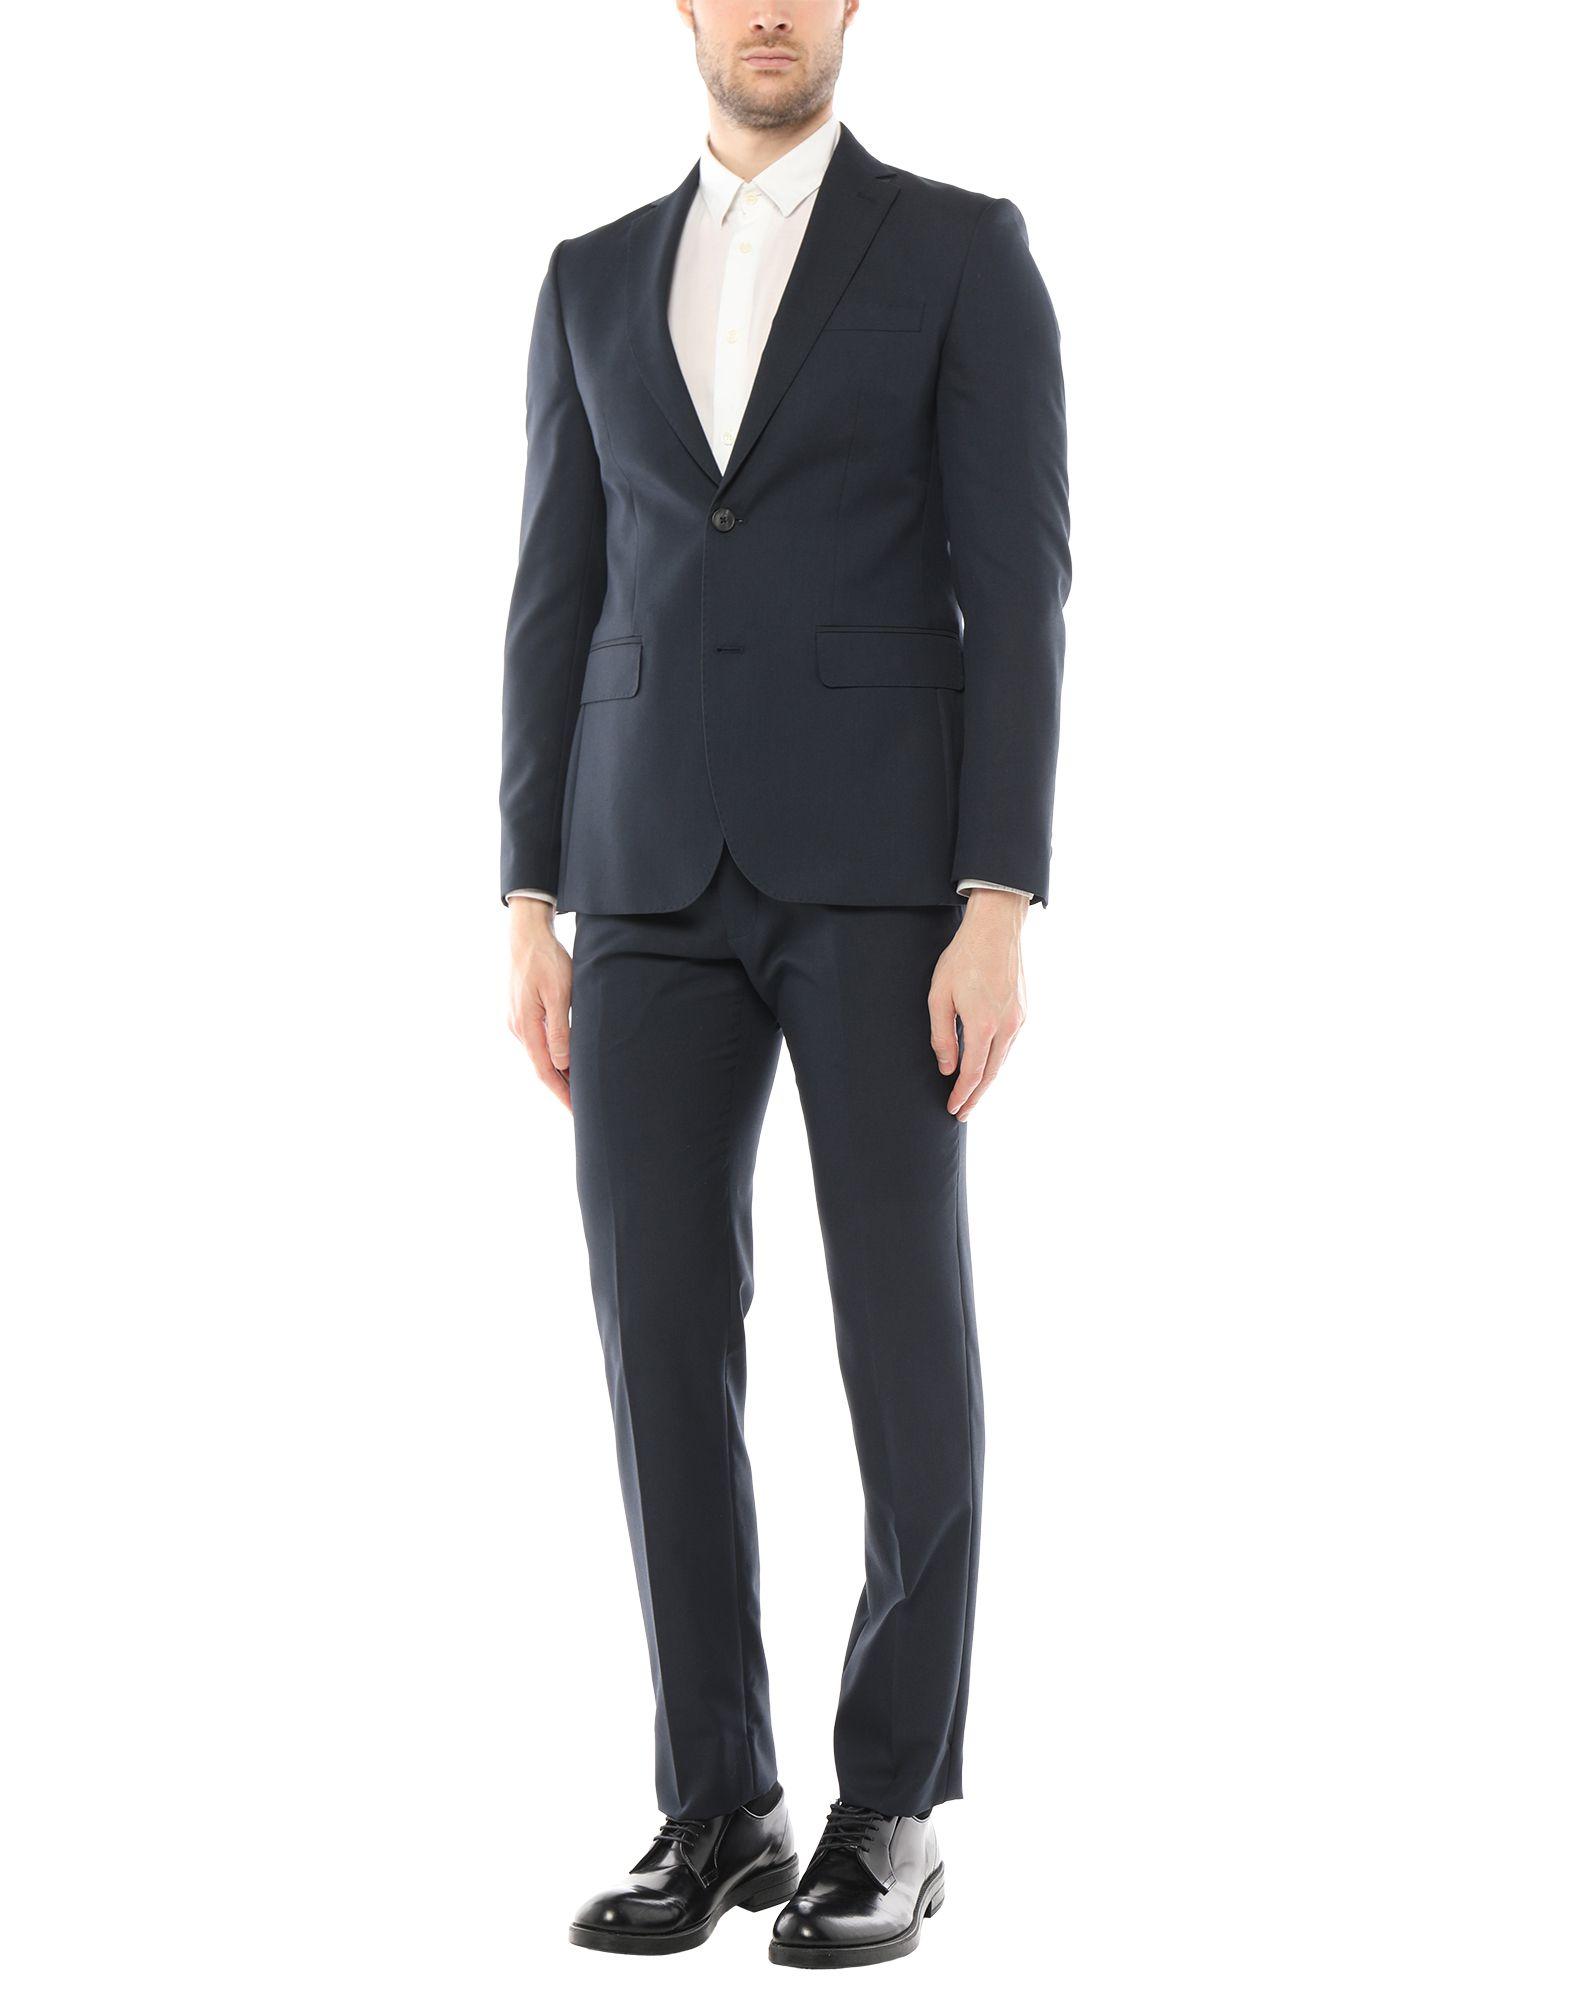 HERMAN & SONS Suits - Item 49566562